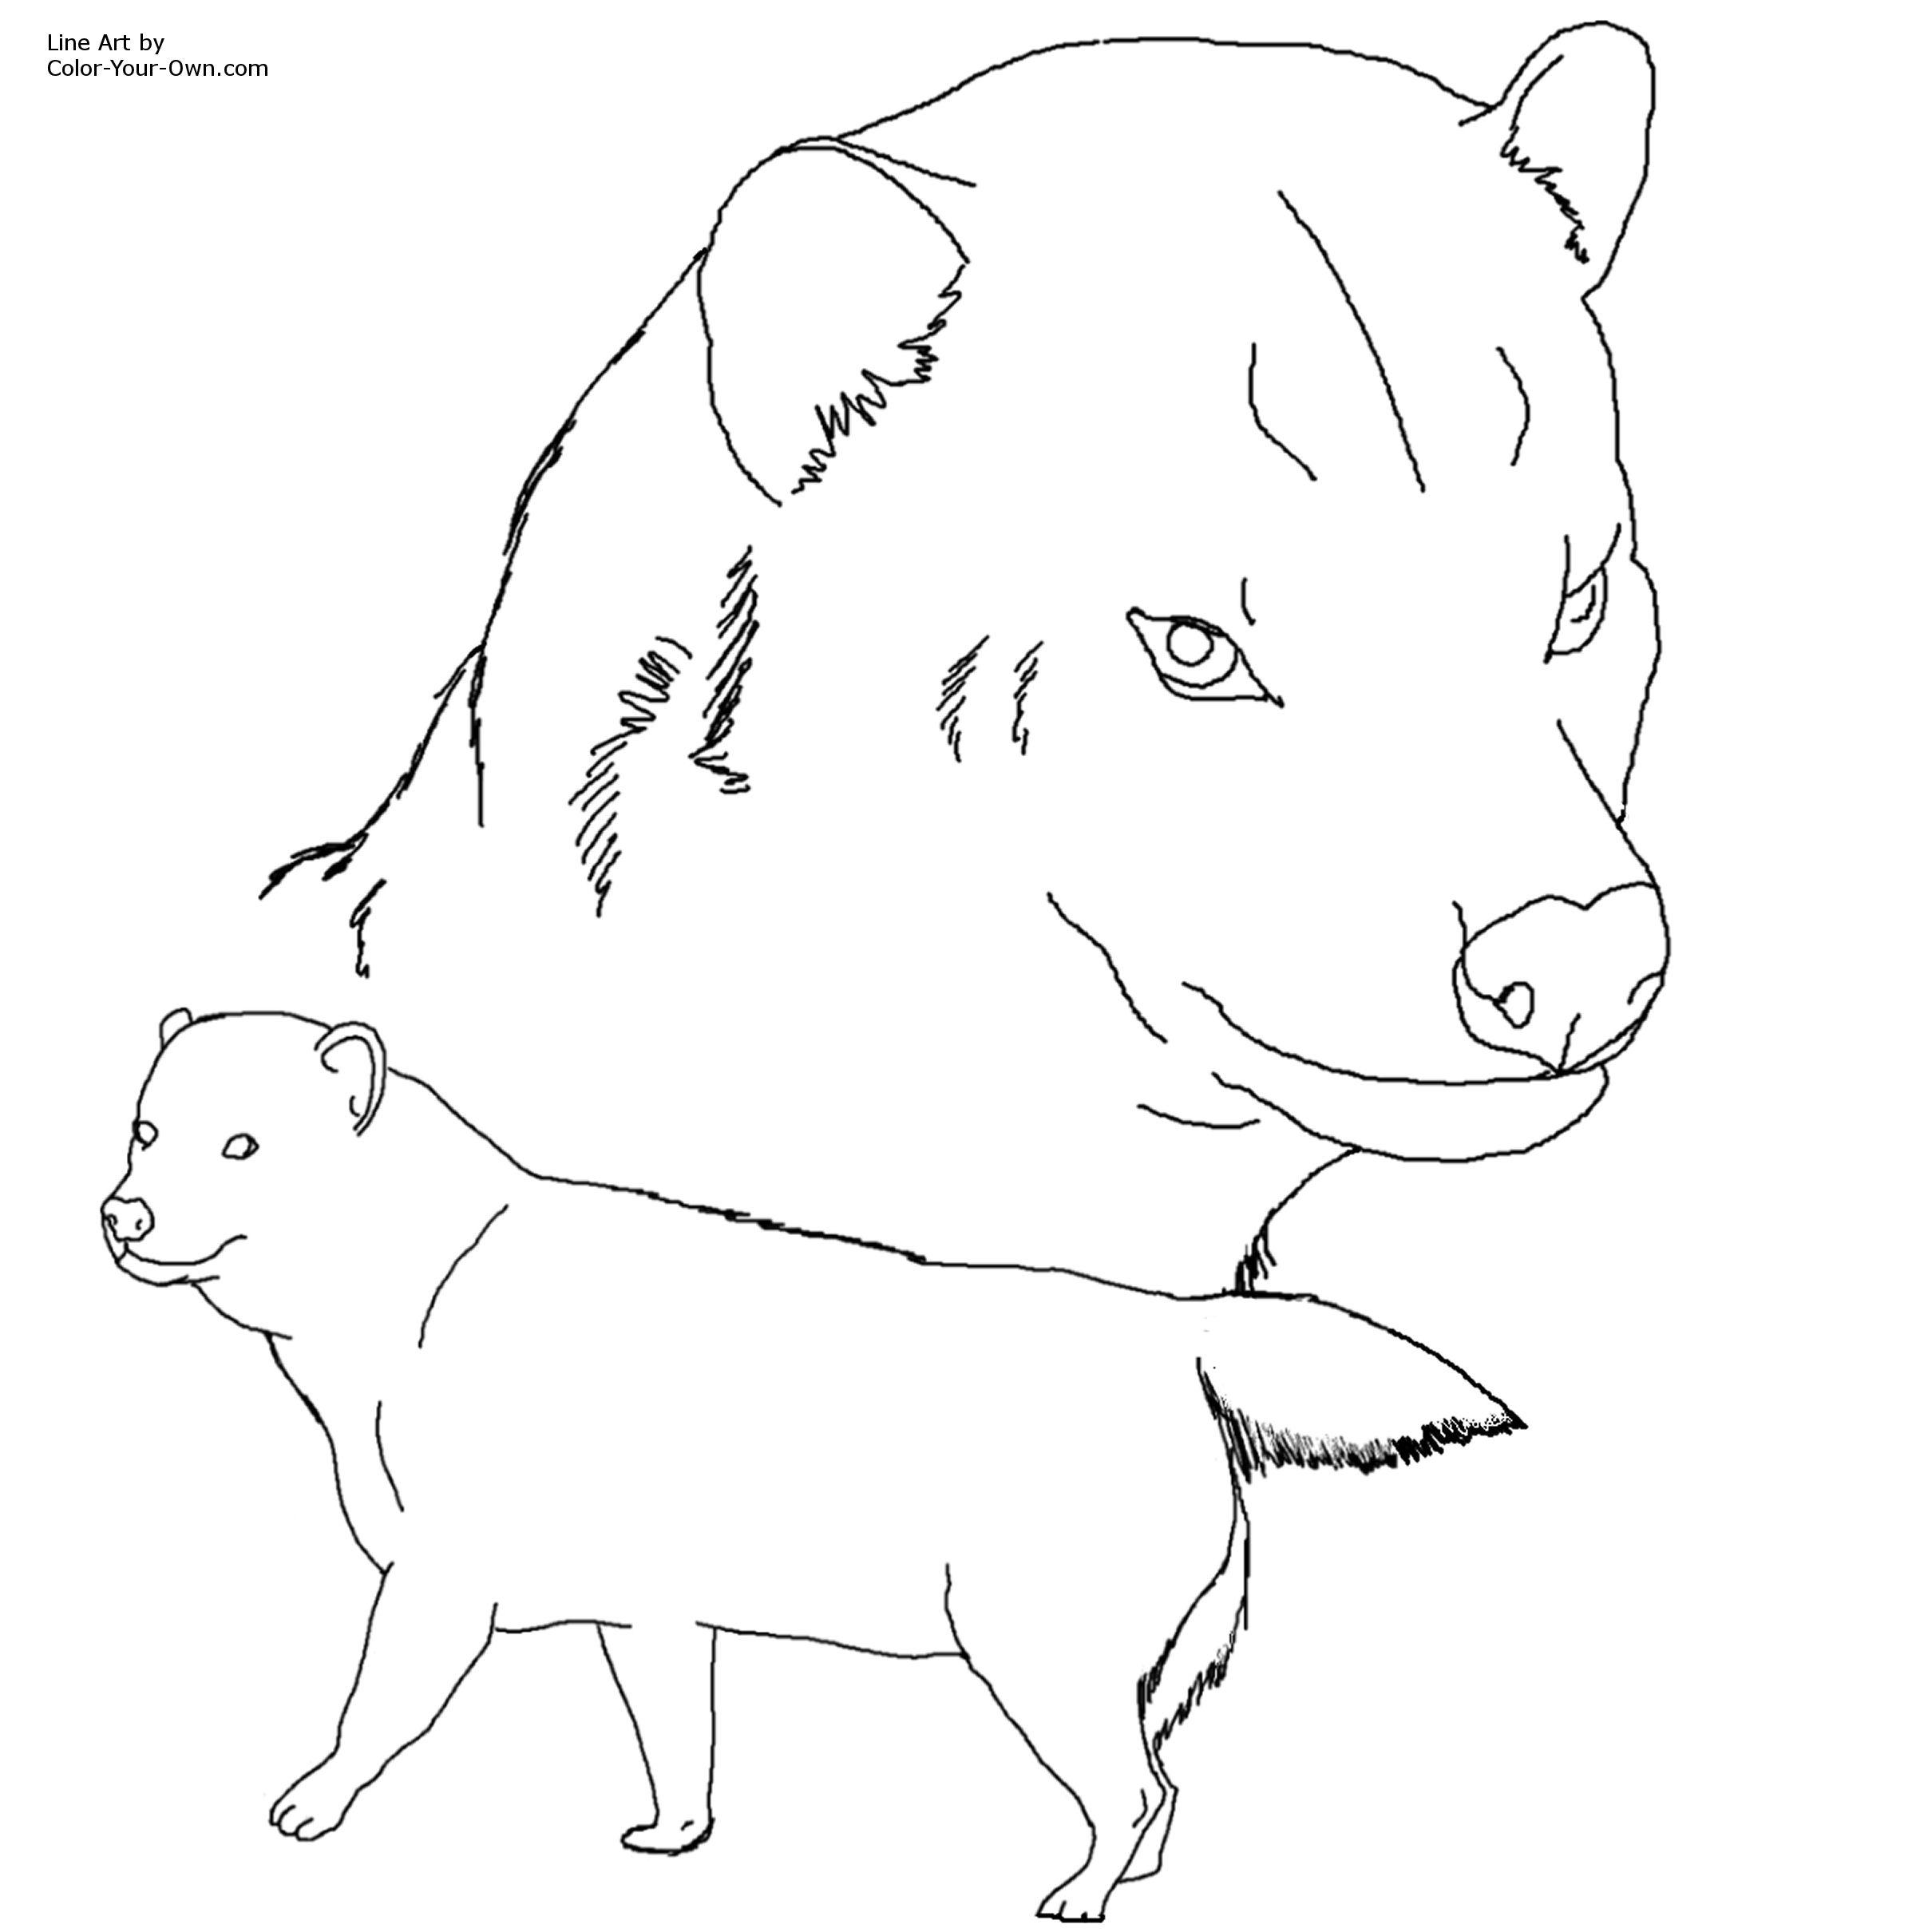 ... Coloring Page Labrador Retriever Outline Sketch Just Free Image